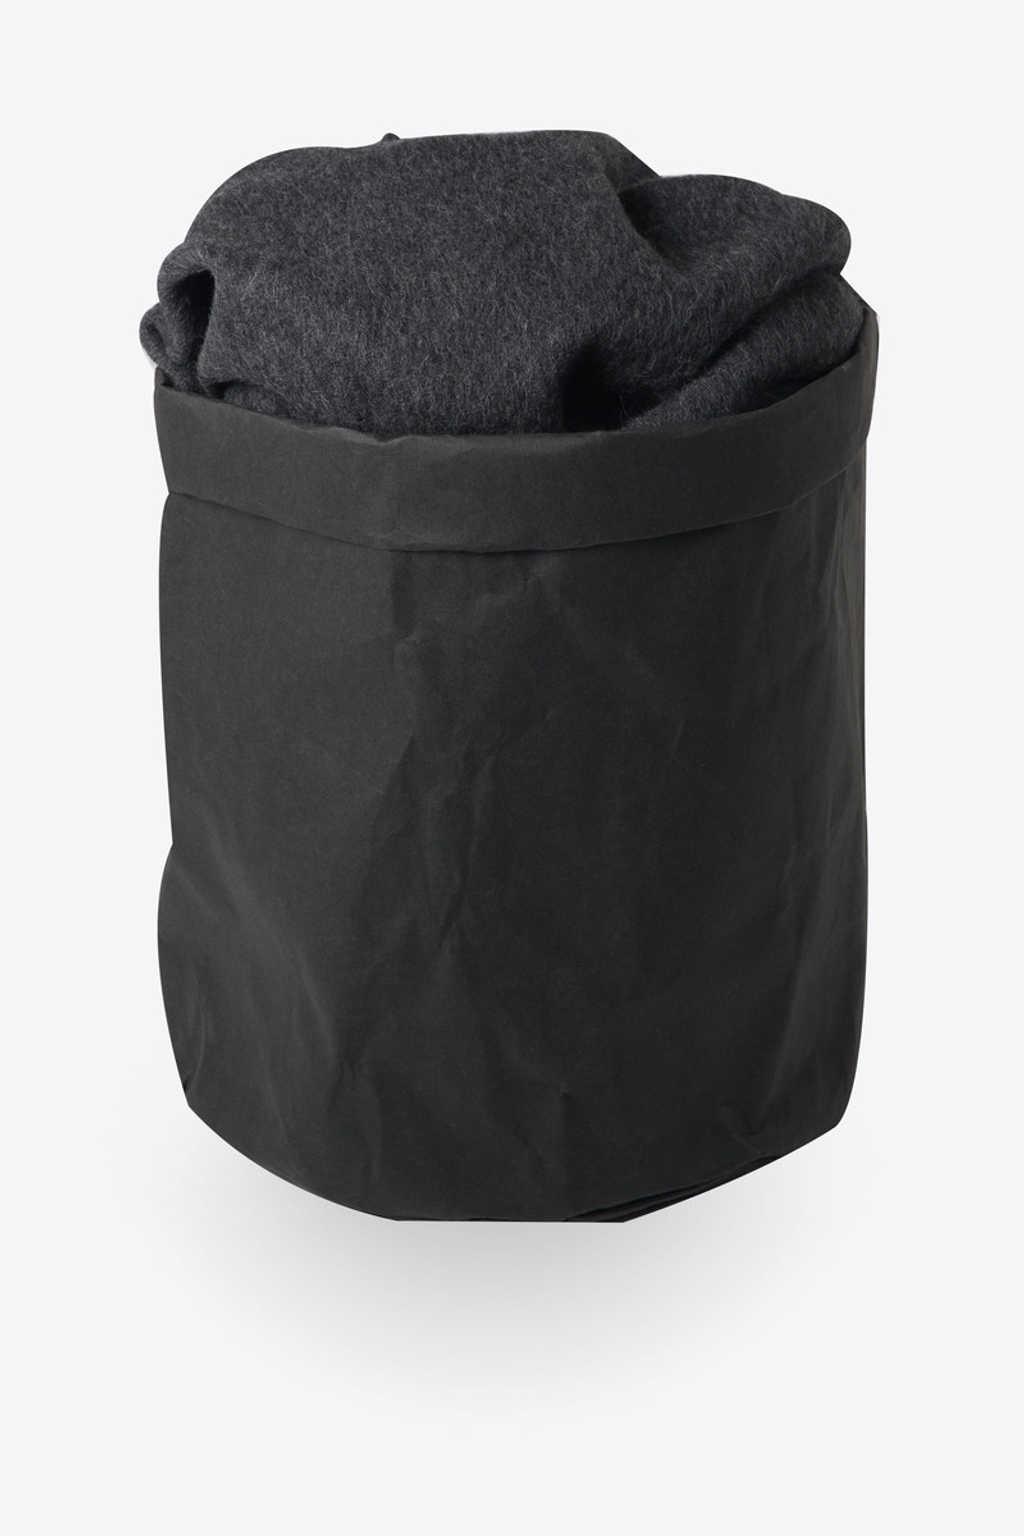 Extra Large Paper Bin 1027 Black 2